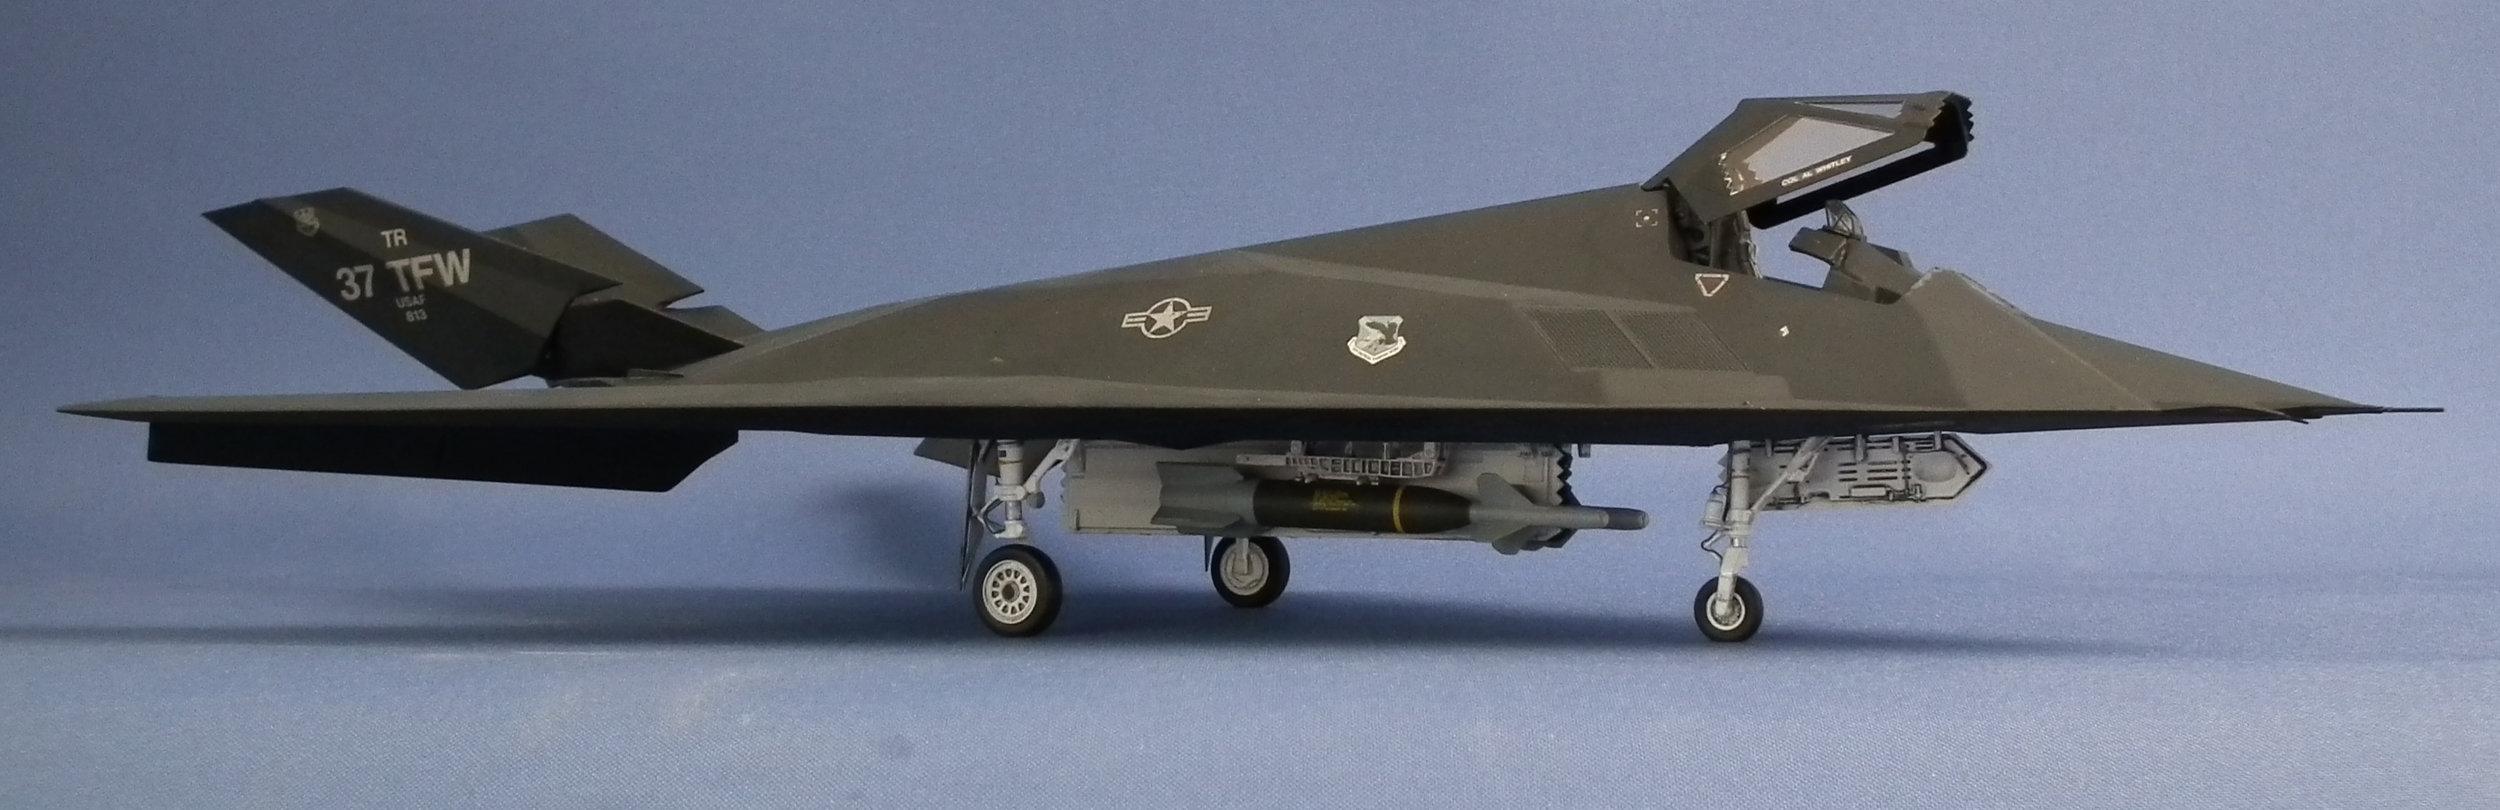 F-117A 1.JPG